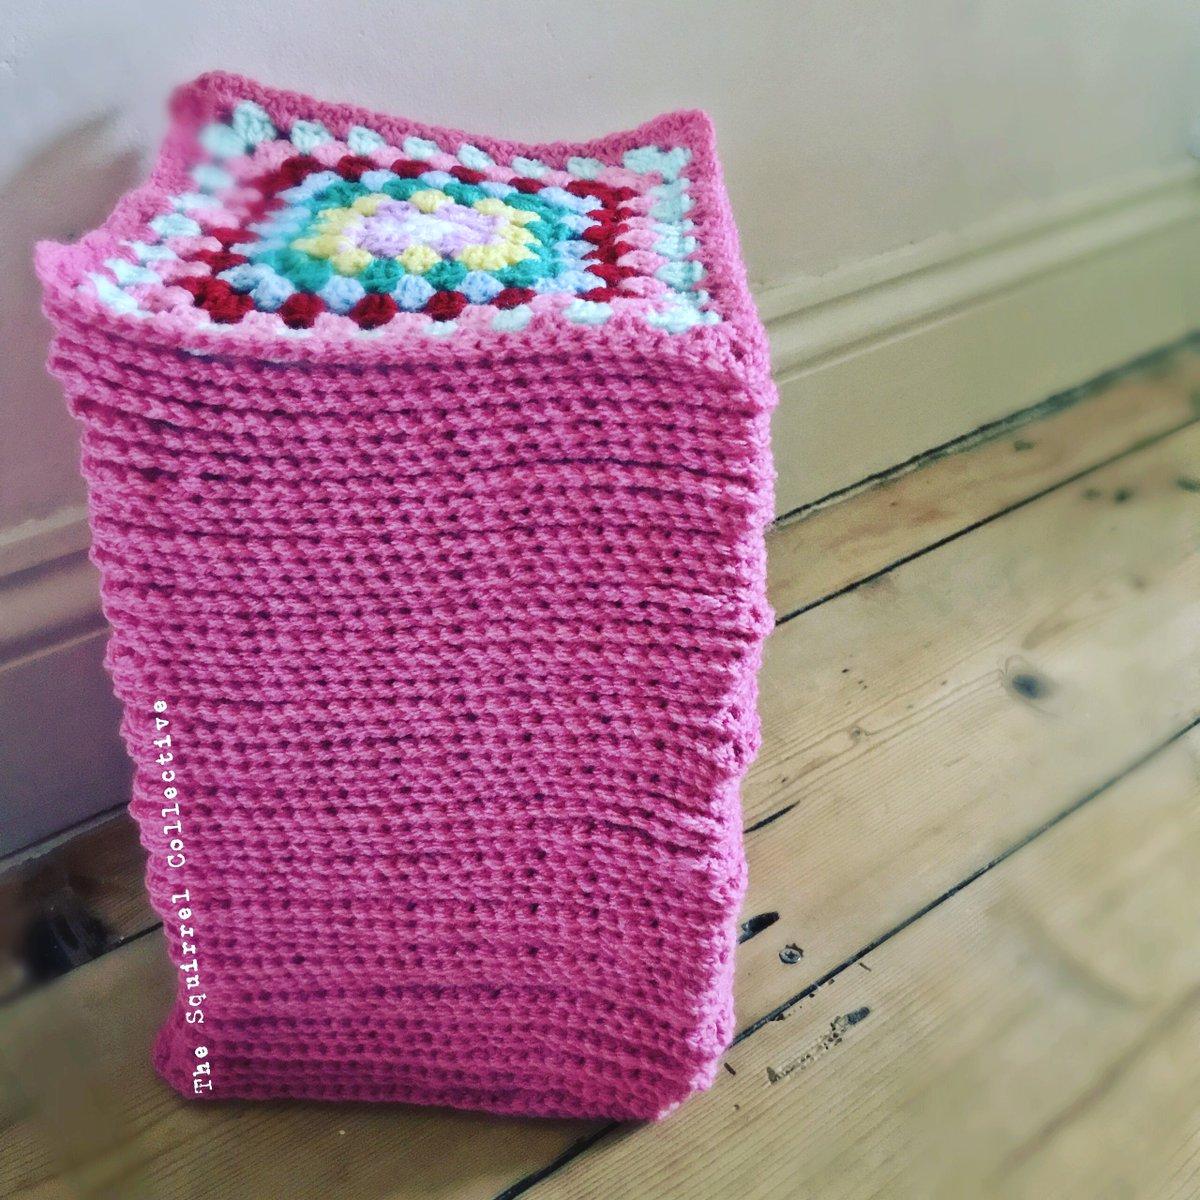 48 granny squares ready to join! T  #handmade #crochet<br>http://pic.twitter.com/OBnkBXXnN5